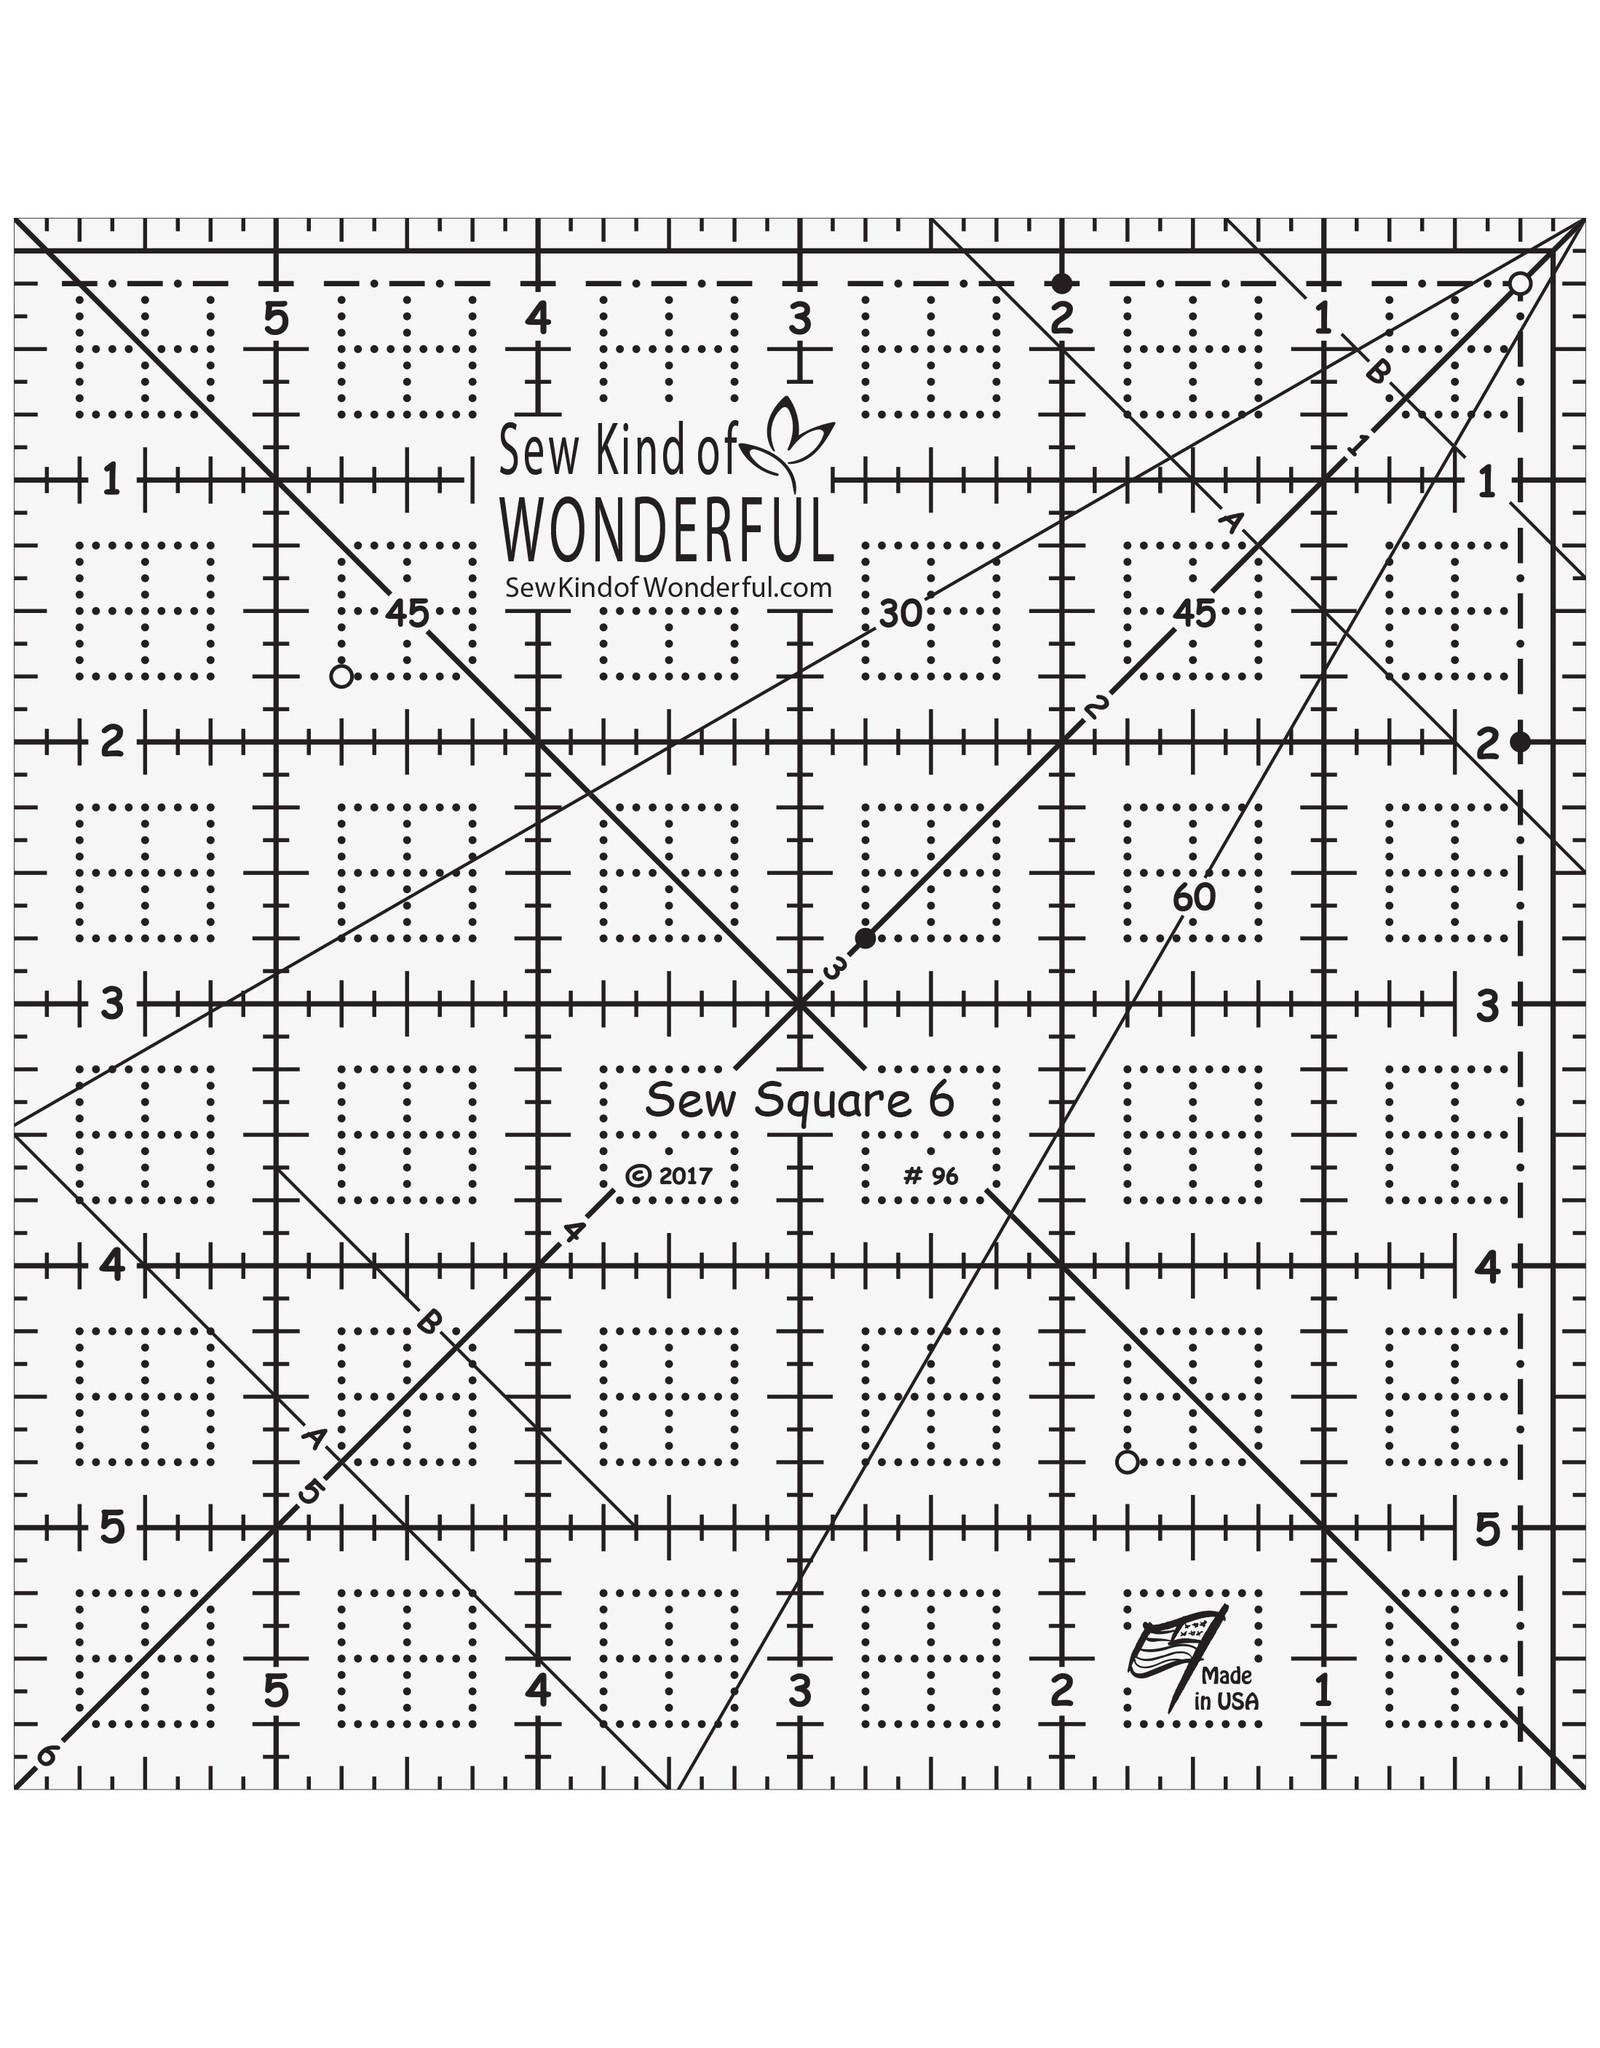 Sew Kind of Wonderful Sew Square Ruler - 6 inch